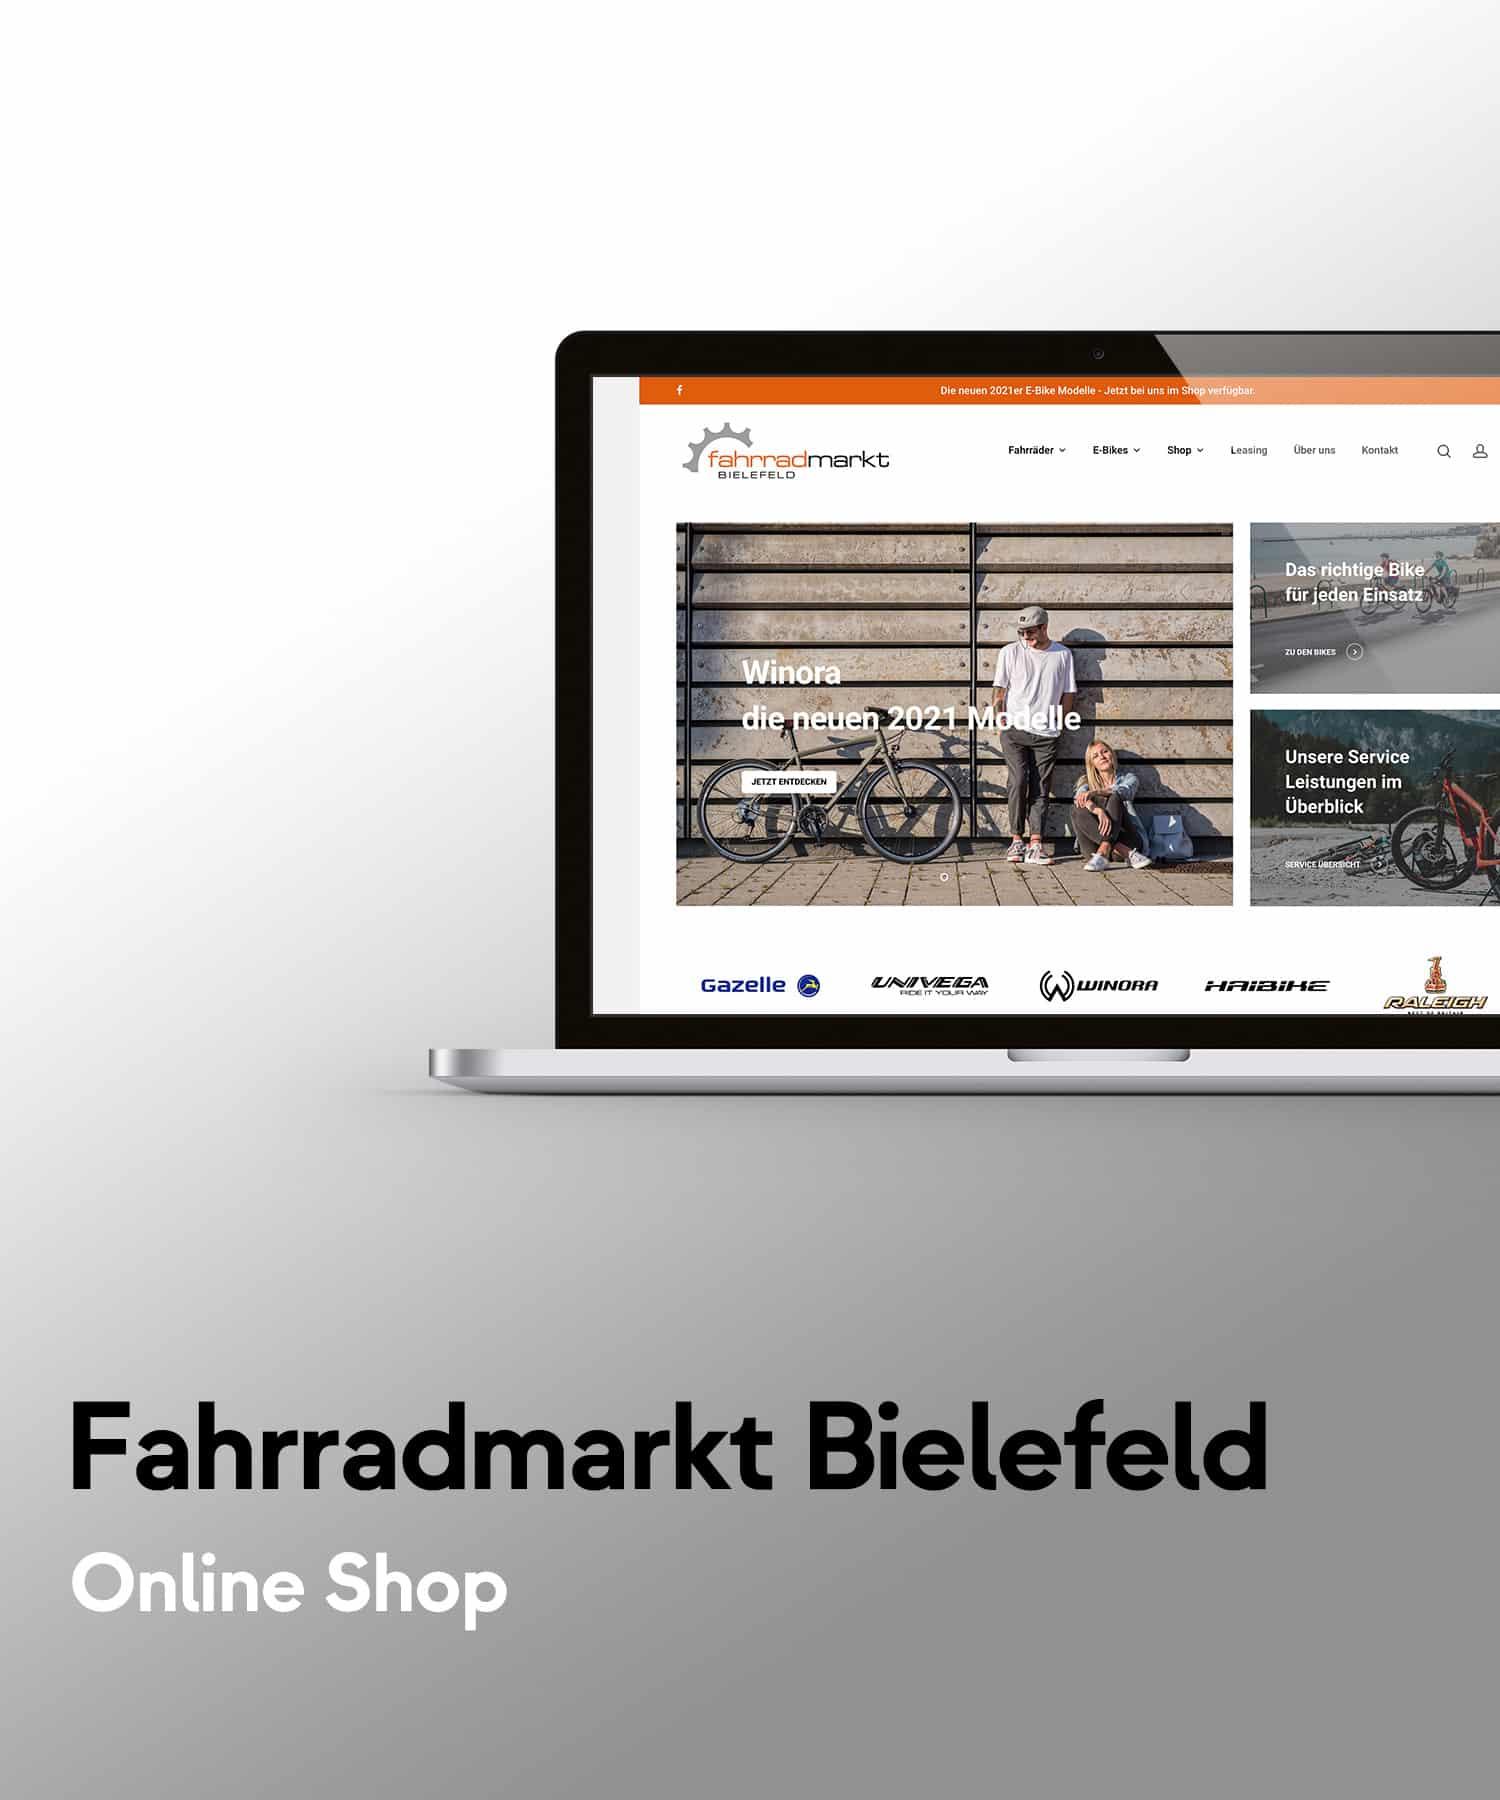 Fahrradmarkt Bielefeld